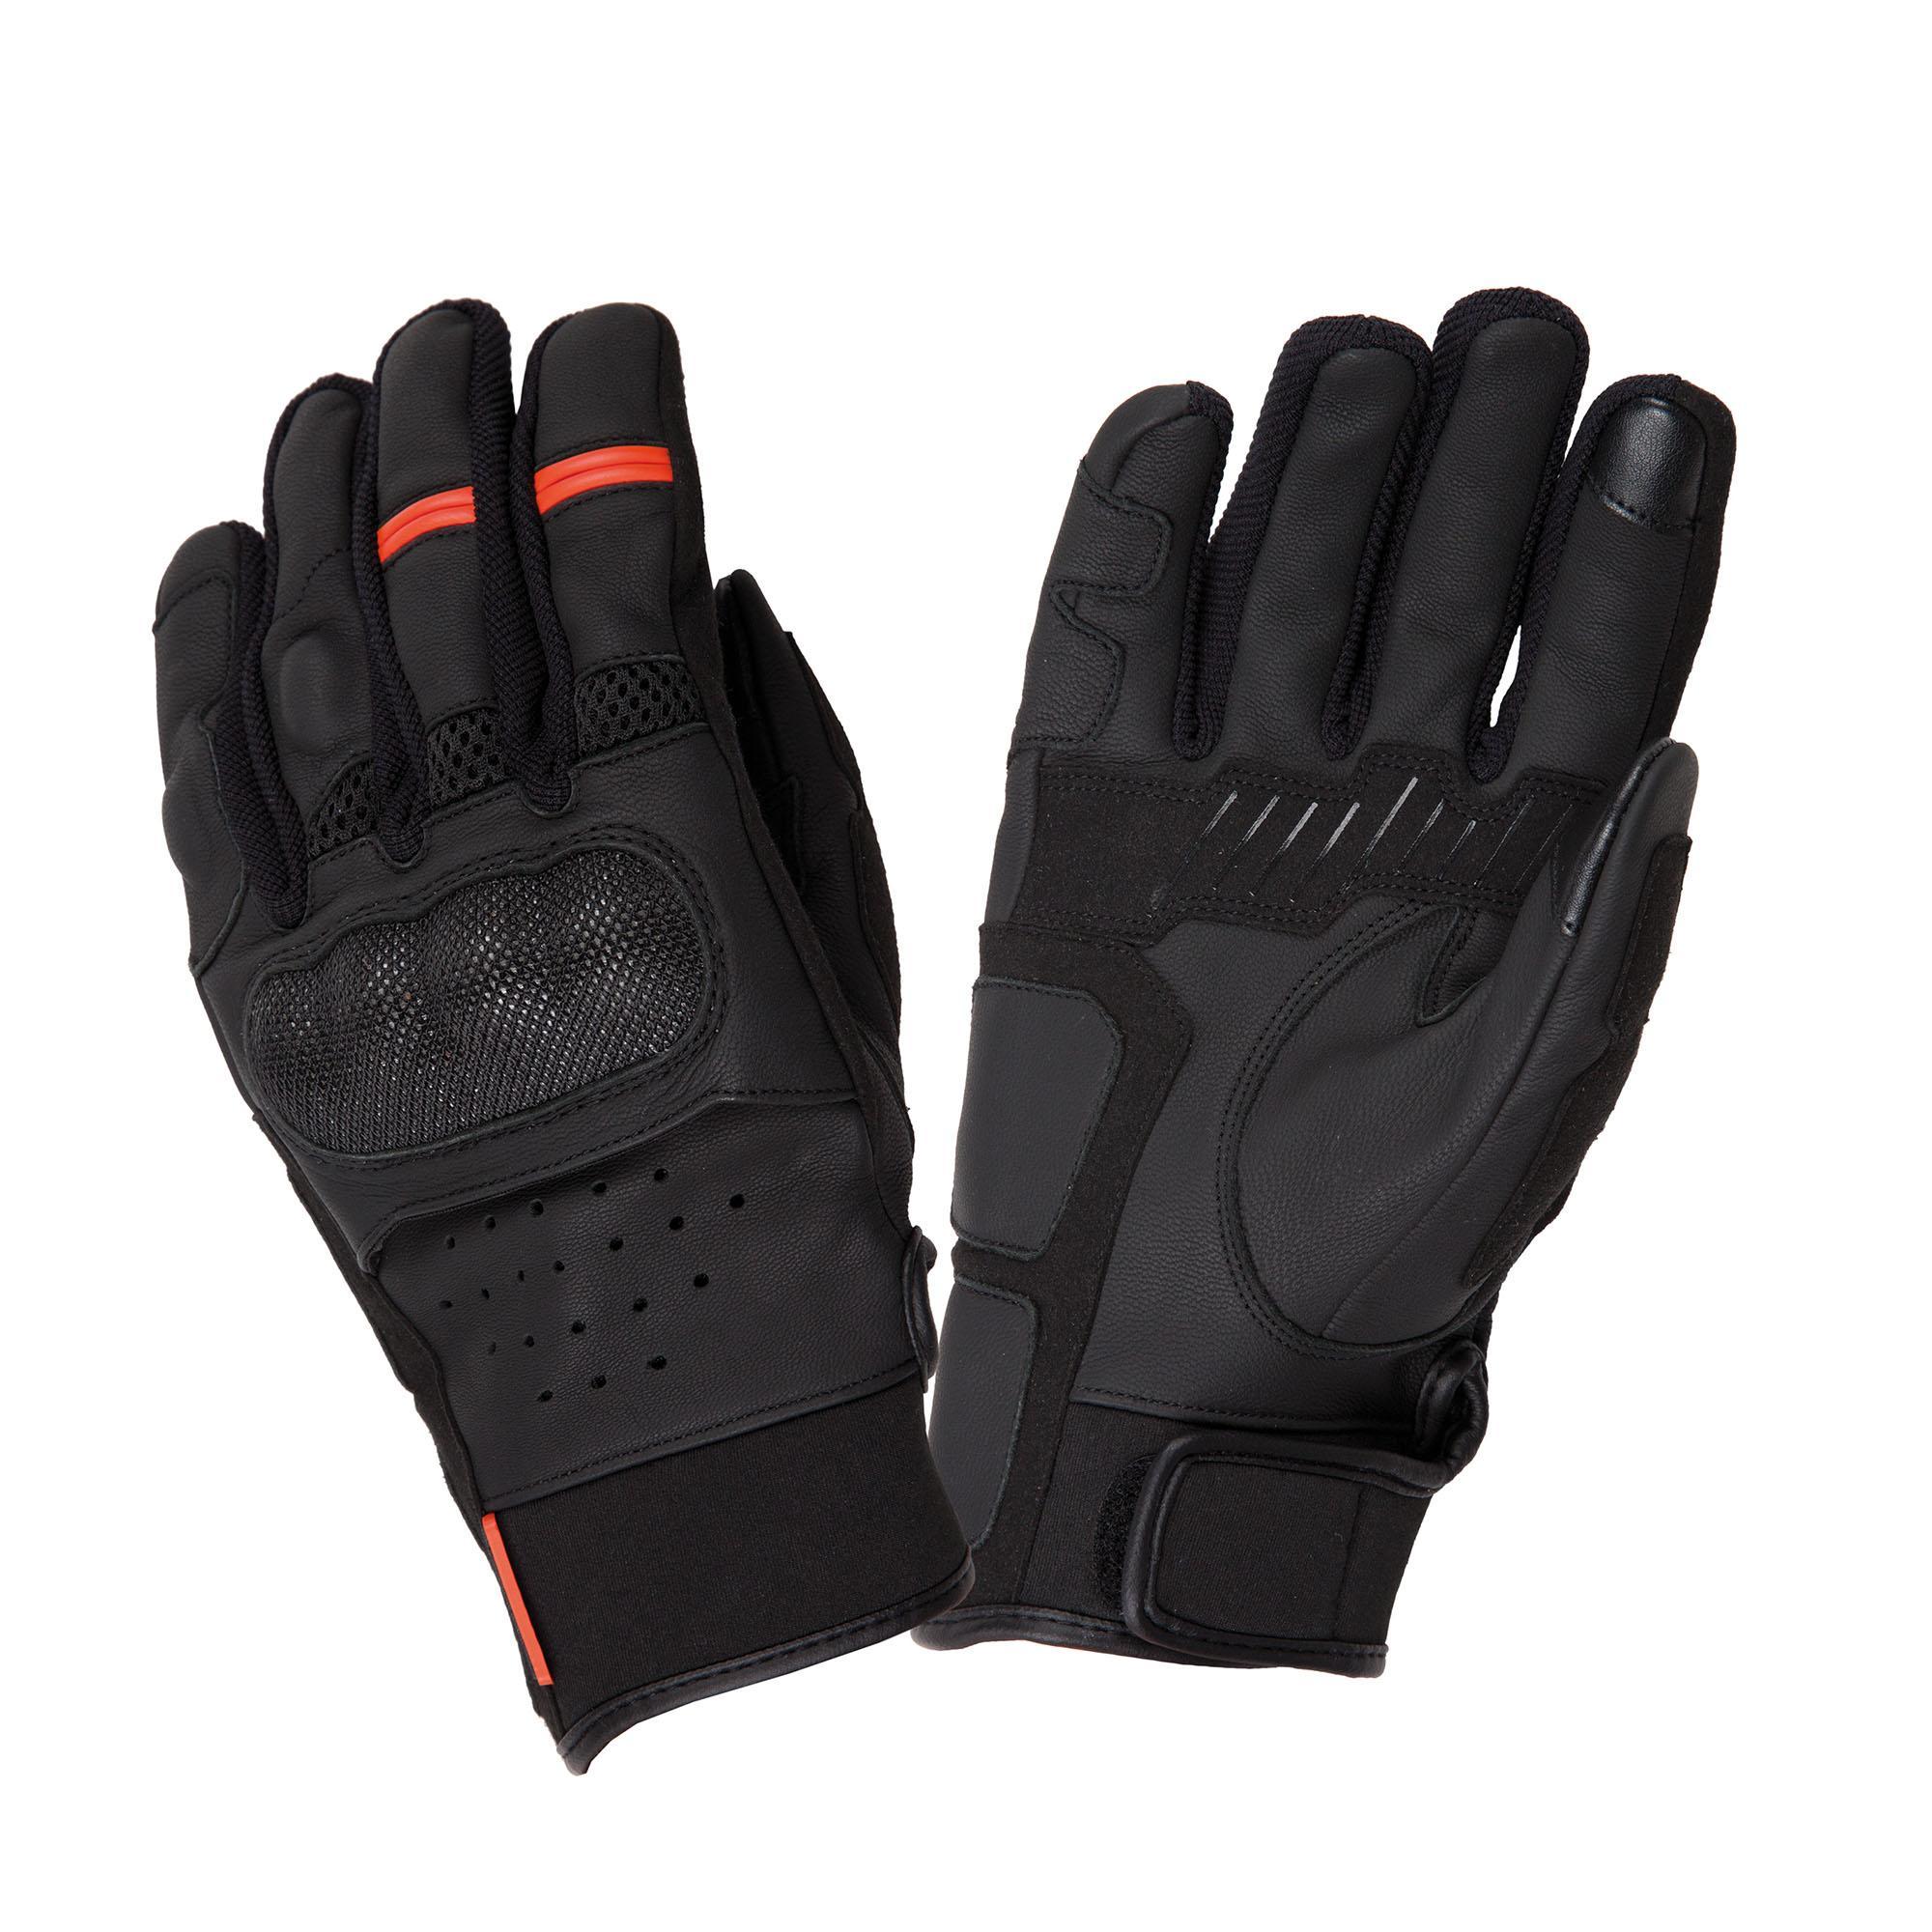 Glove Mrk Skin Black